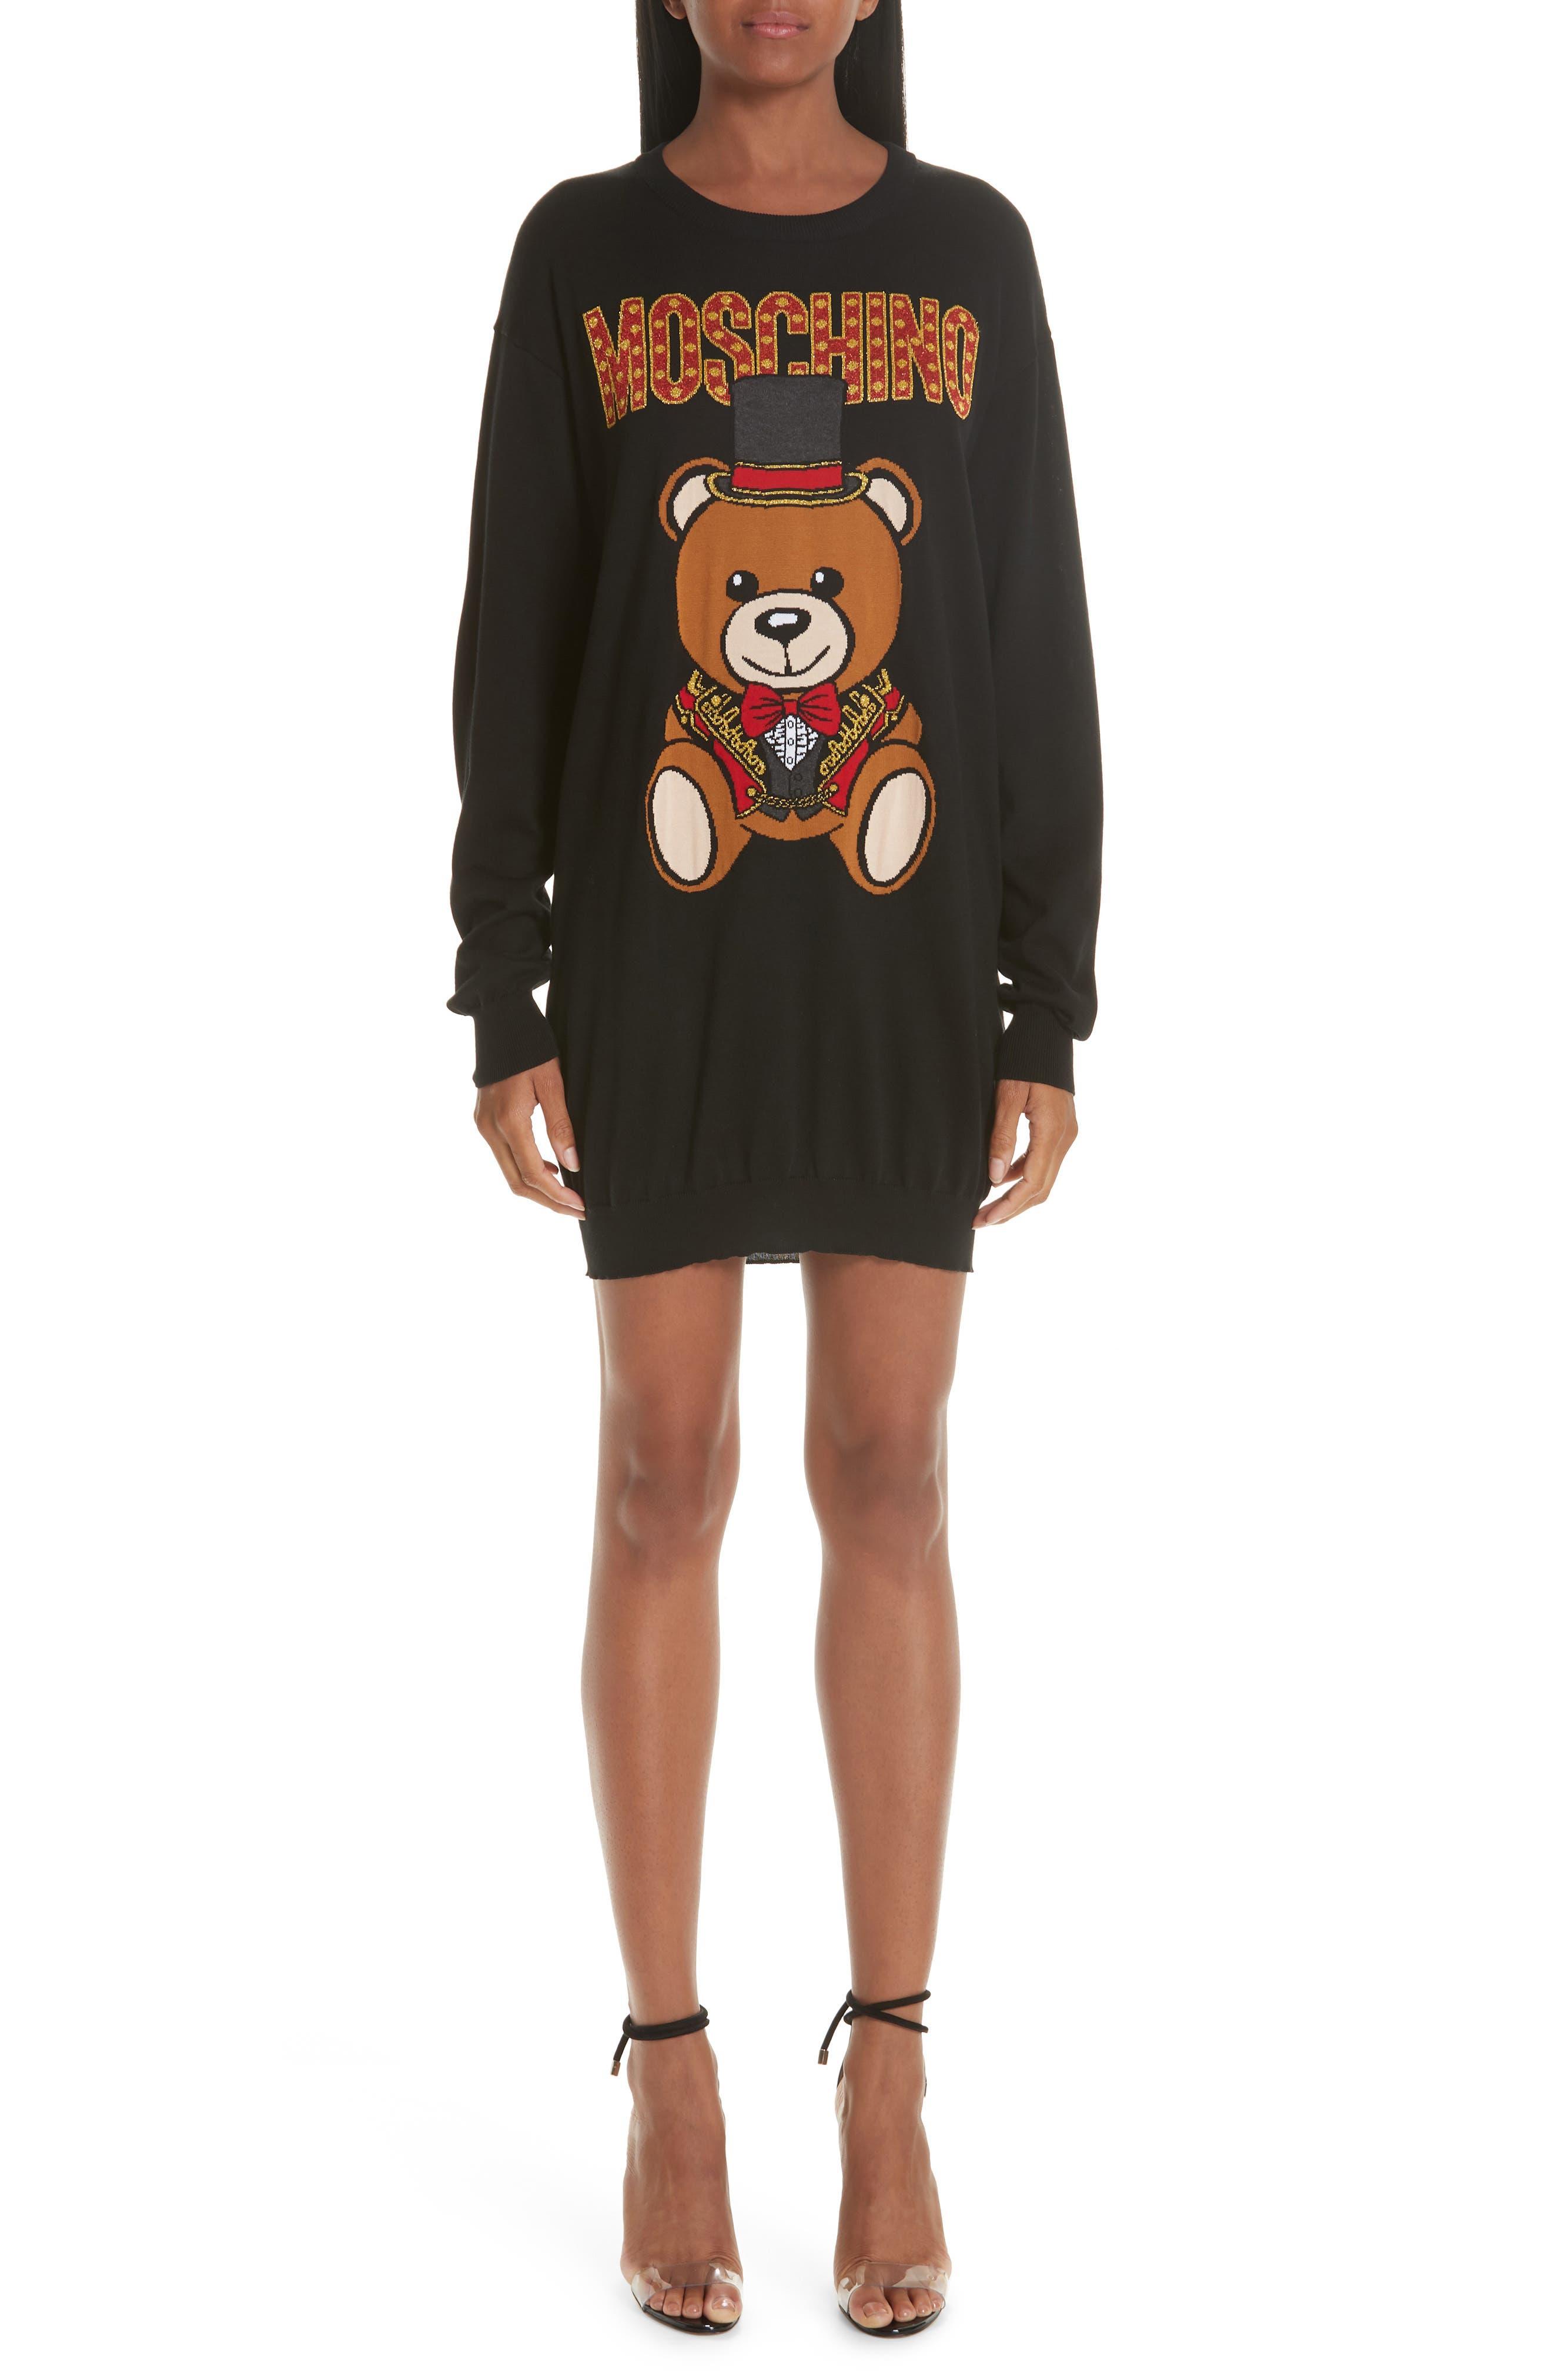 MOSCHINO, Circus Teddy Sweater Dress, Main thumbnail 1, color, BLACK